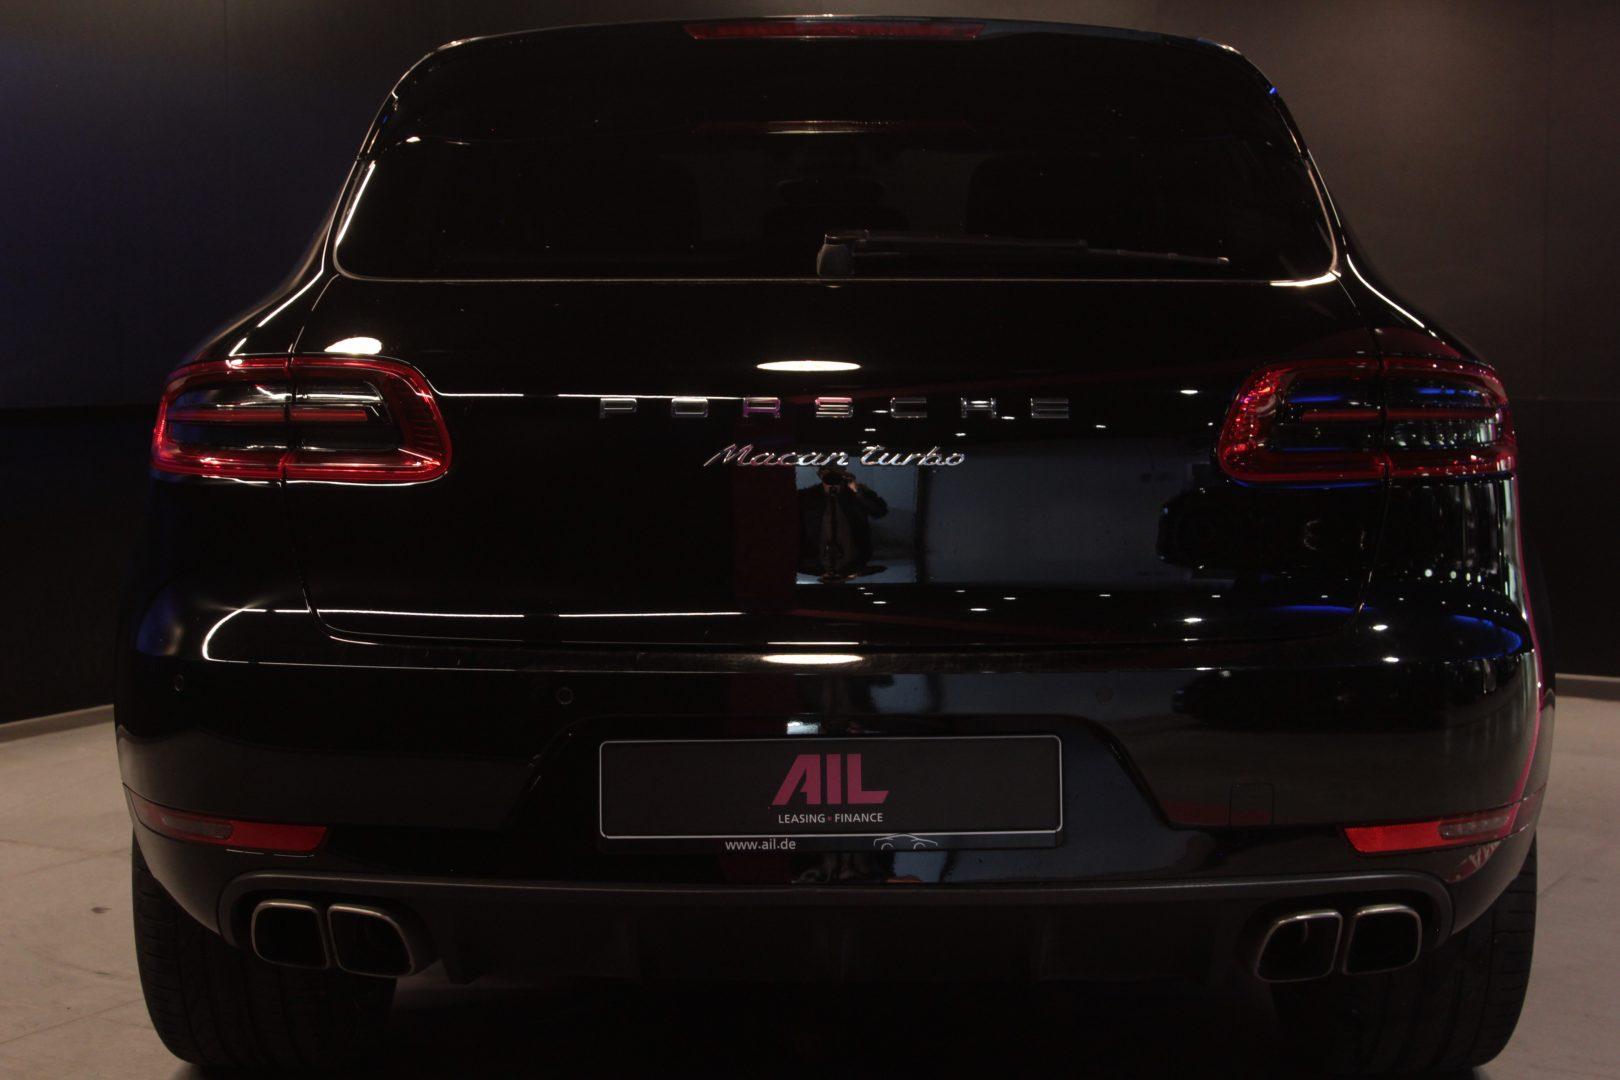 AIL Porsche Macan Turbo 7